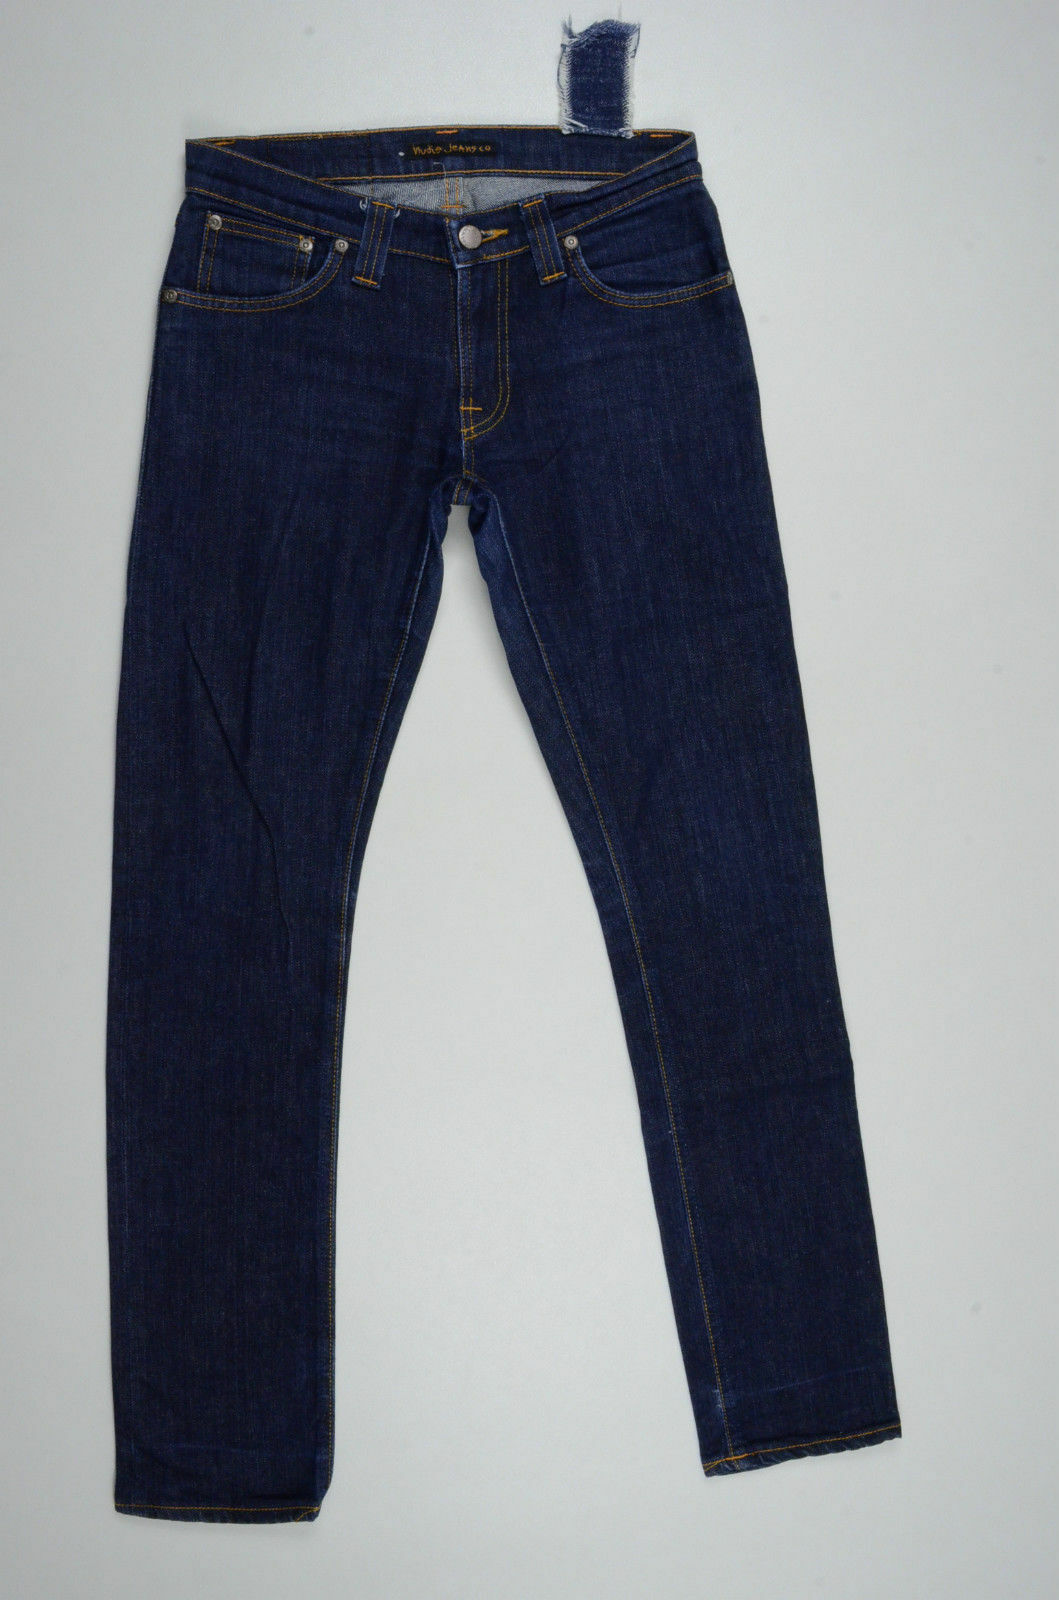 Nudie Jeans 'SUPER SLIM KIM DRY STRETCH' Jeans W28 L34 EUC RRP  Womens